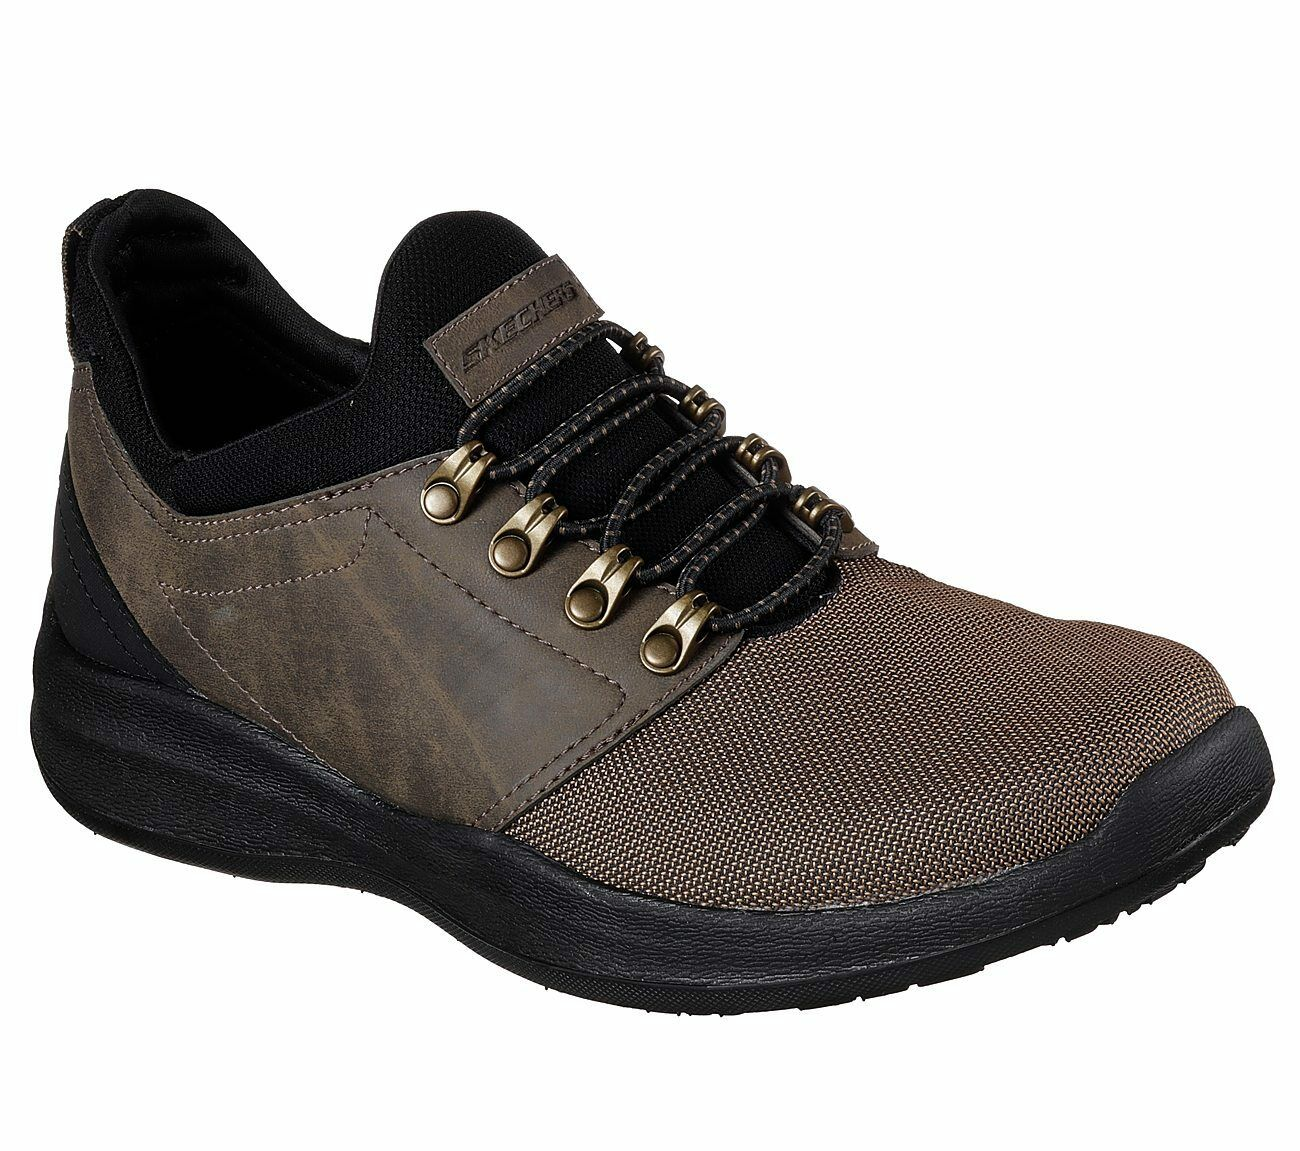 65173 Brown Skechers shoes Men Memory Foam Sporty Casual Comfort Slip On Bungee